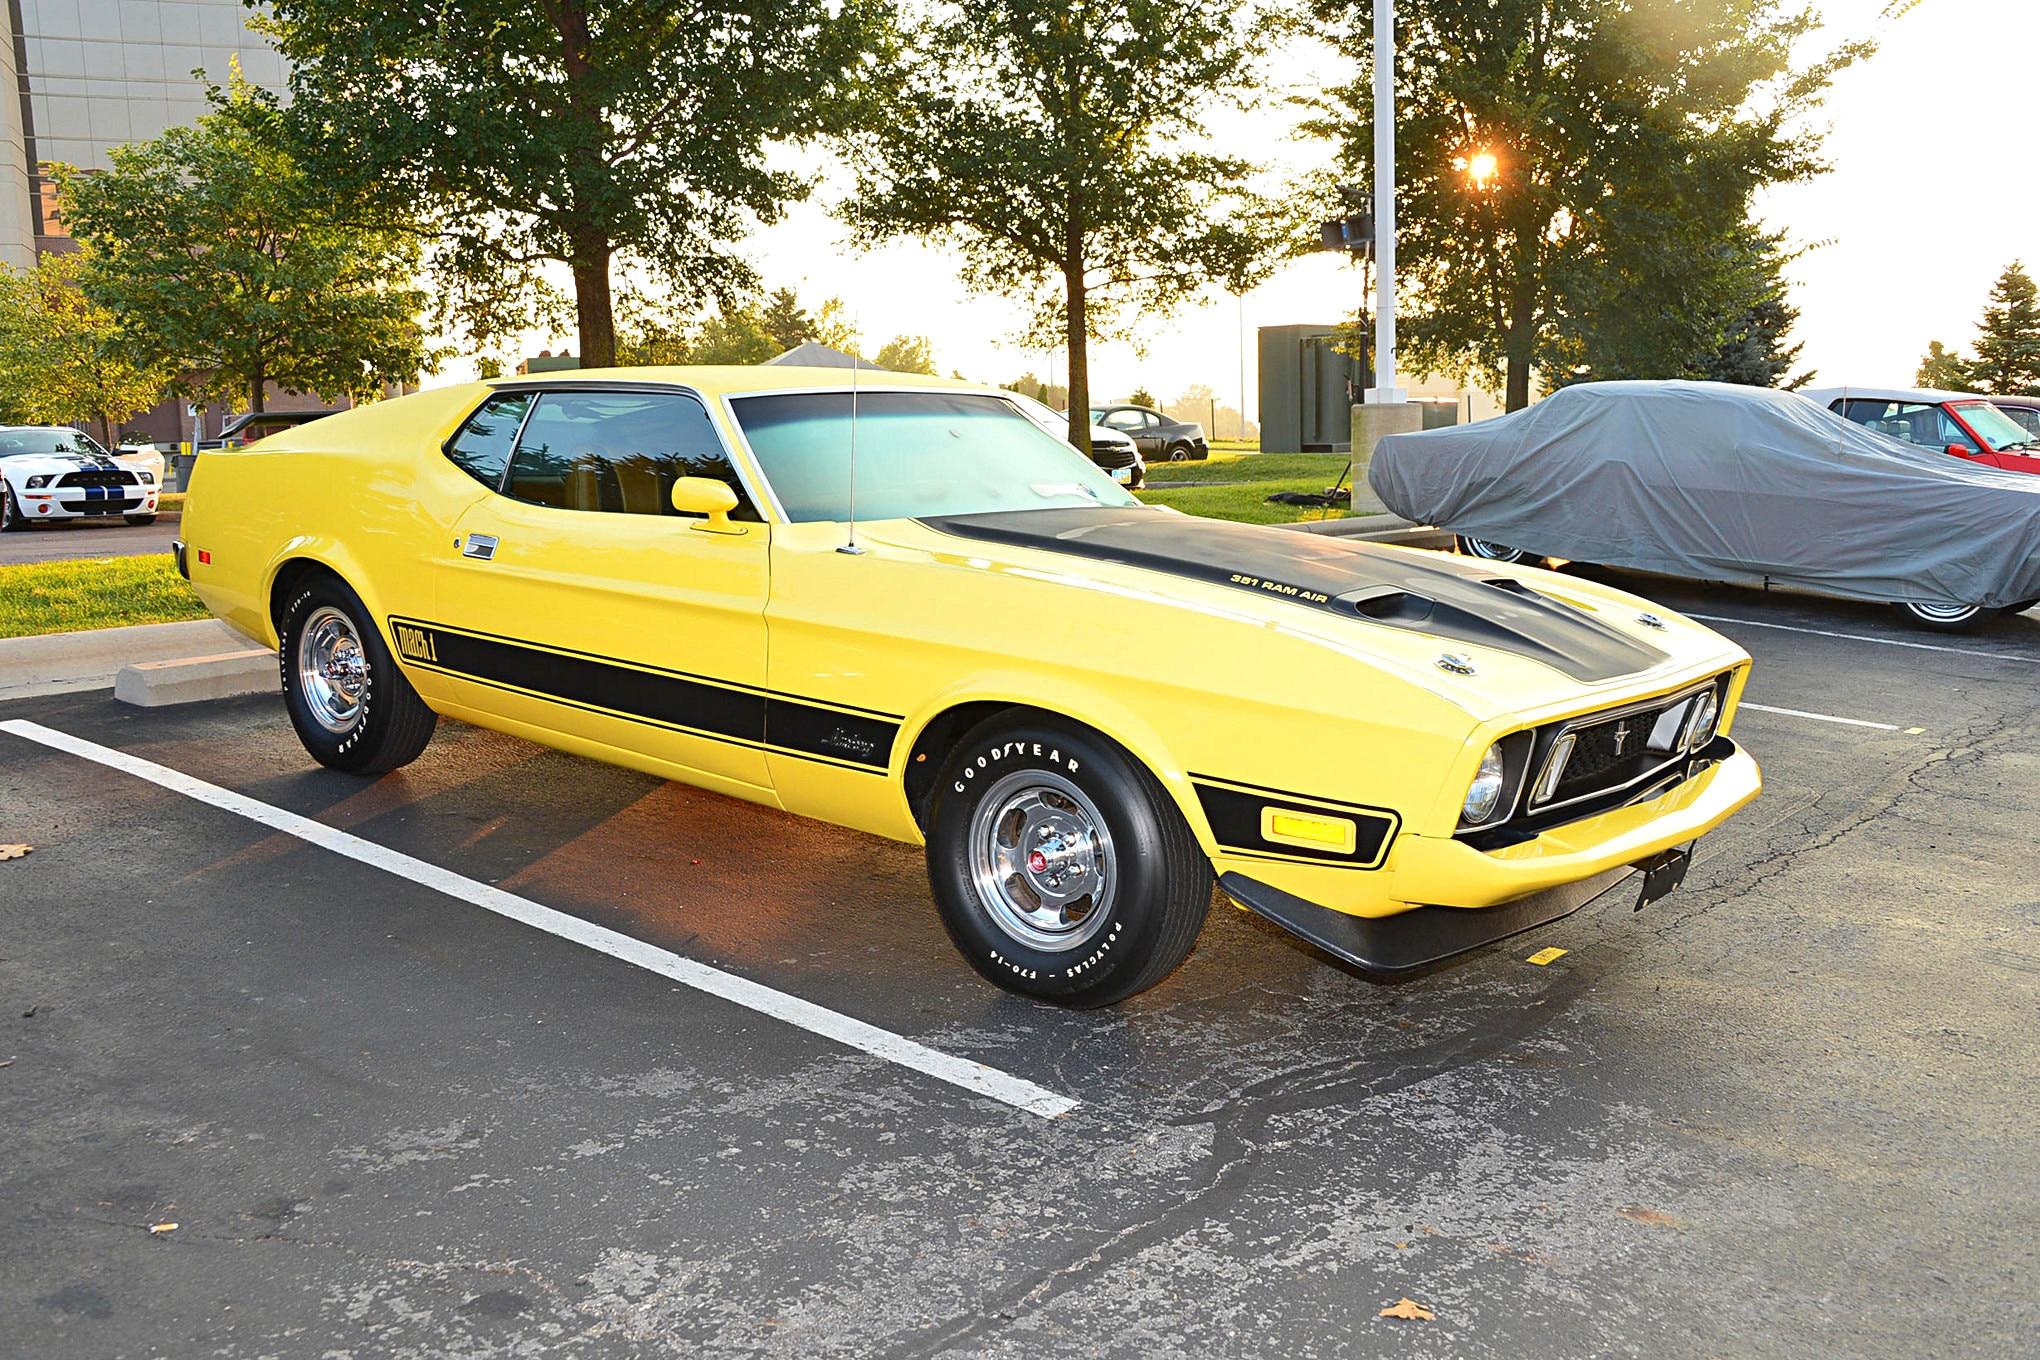 012 1971 73 Mustang SpottersGuide Heasley